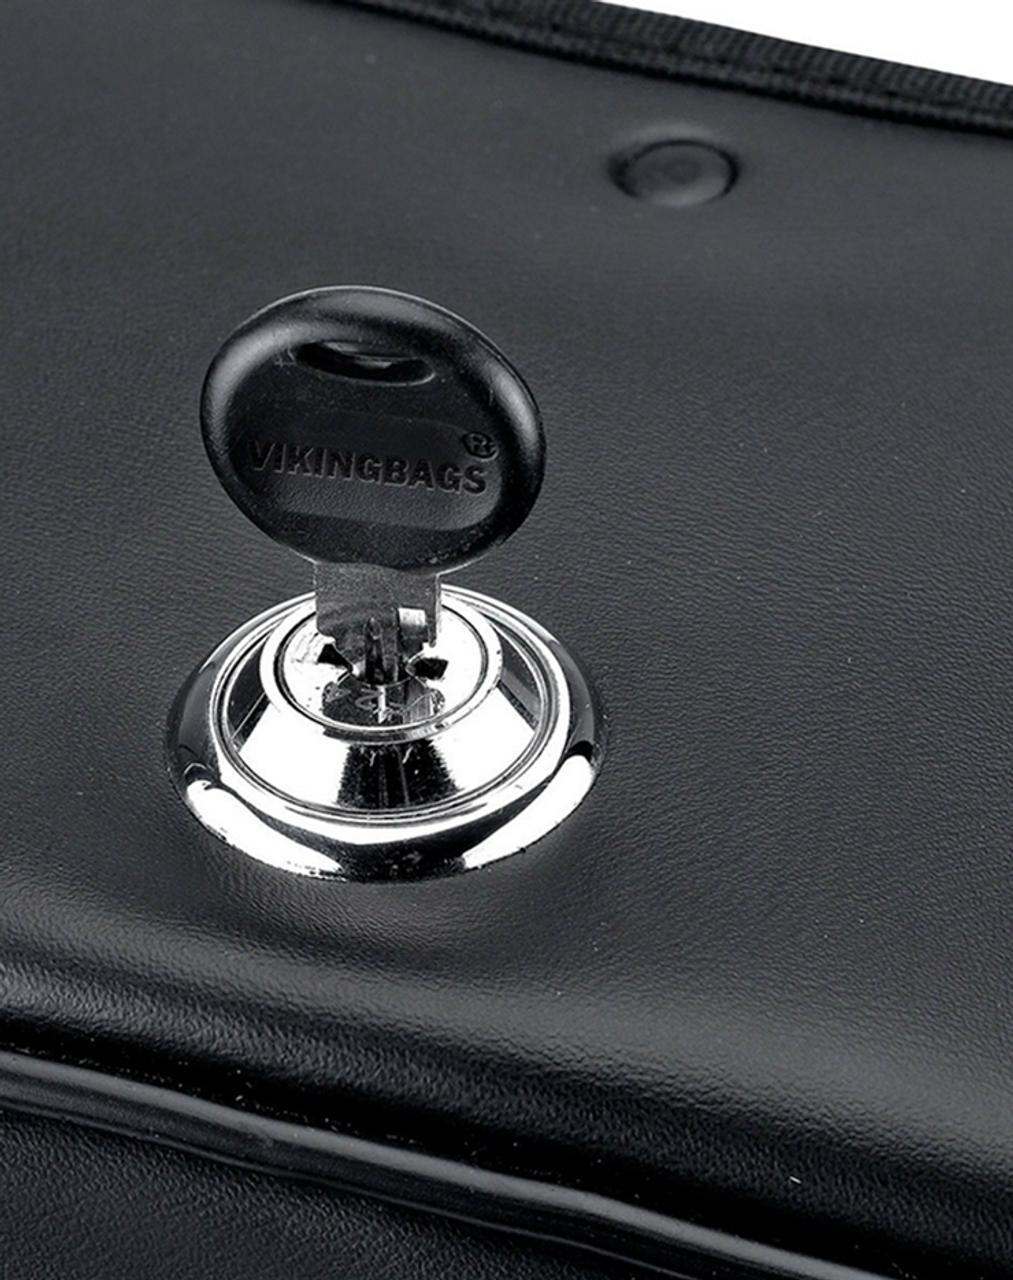 Triumph Rocket III Range Slanted Studded Medium Motorcycle Saddlebags Key Lock View